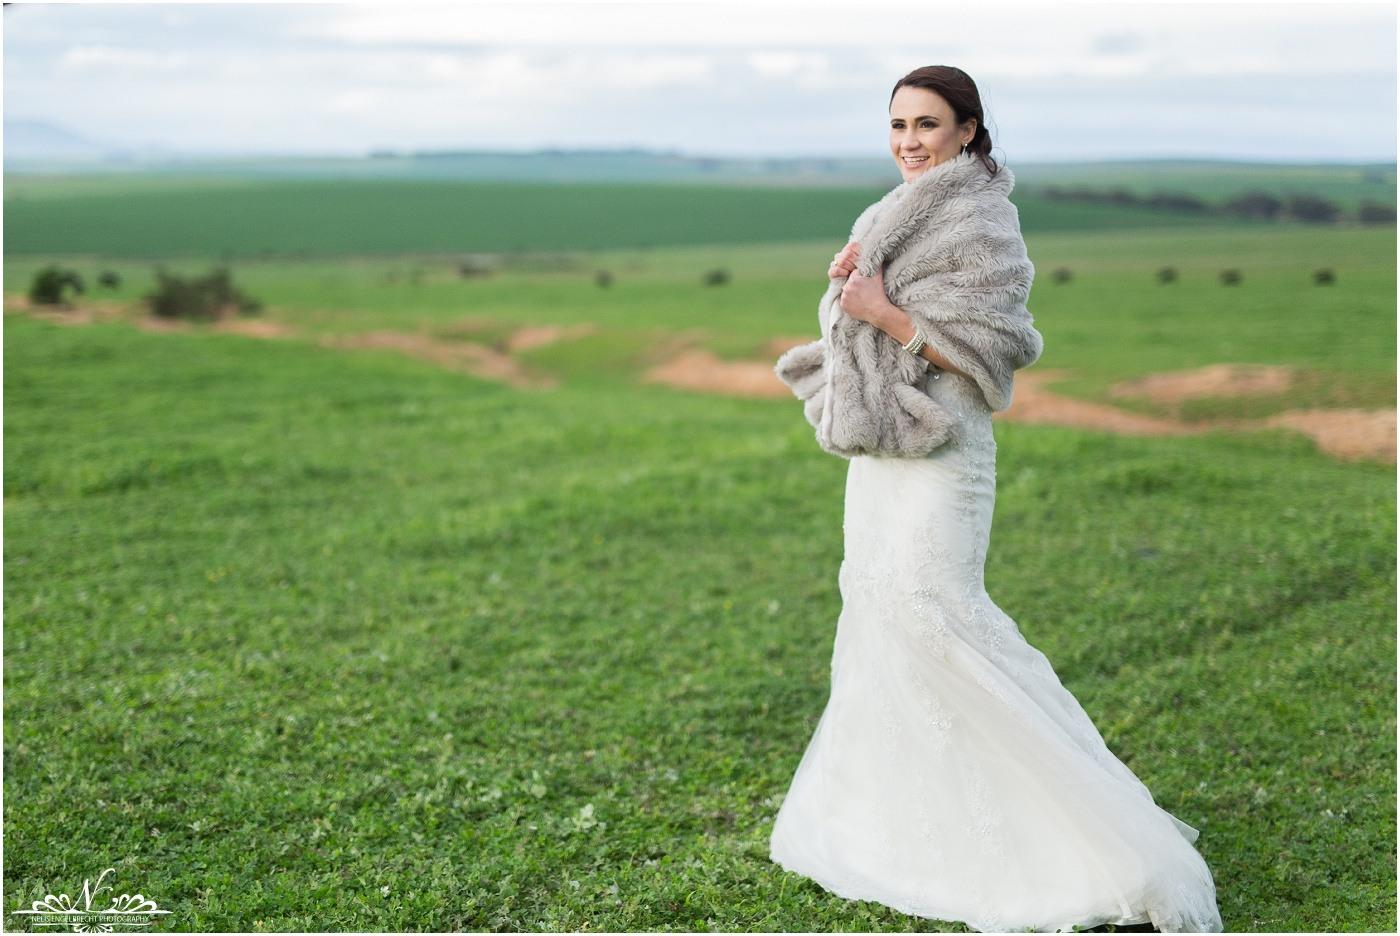 Eensgezind-Wedding-Photos-Nelis-Engelbrecht-Photography-106